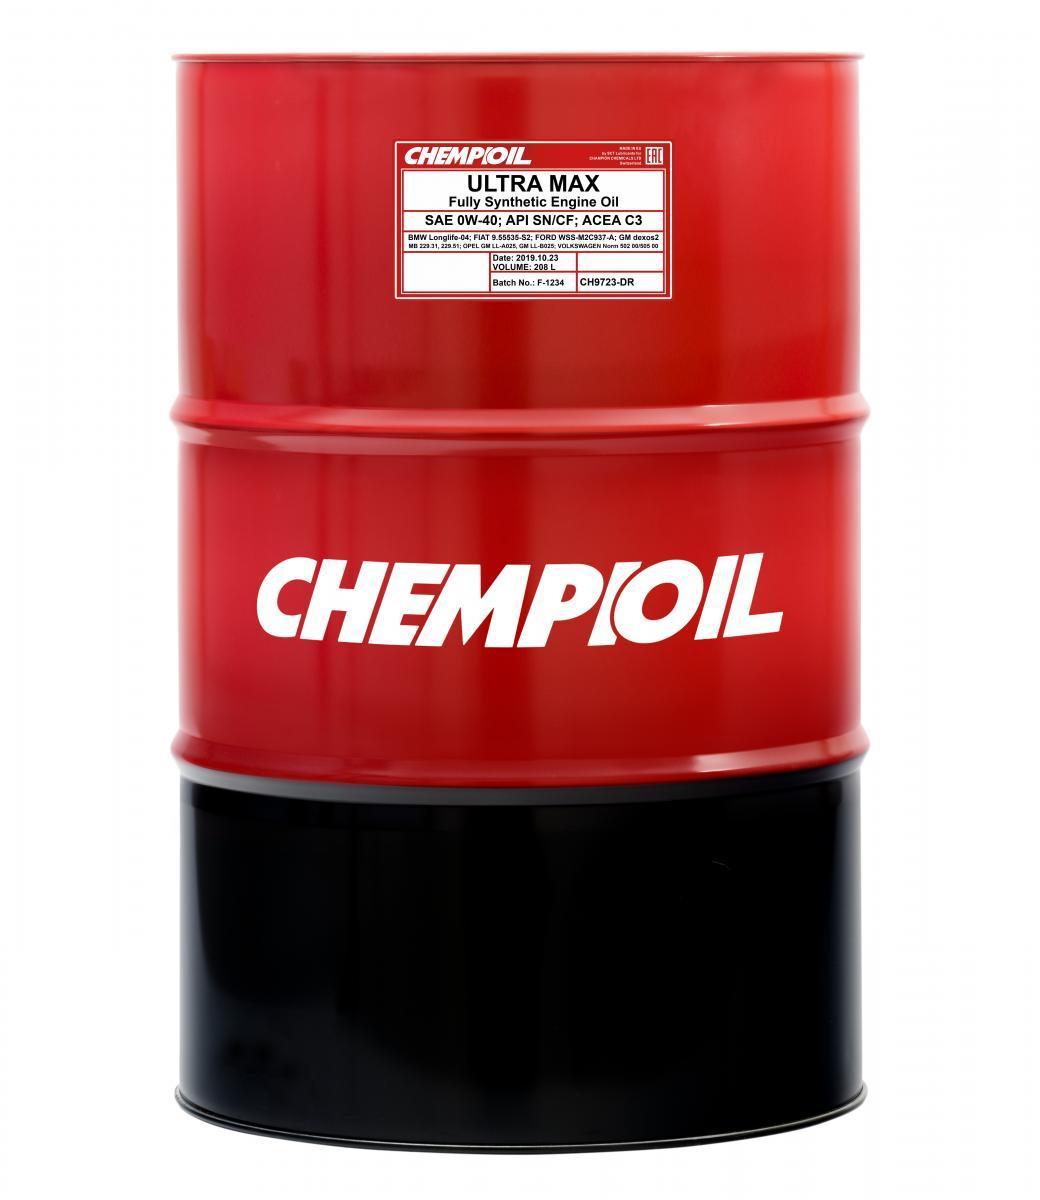 CHEMPIOIL Ultra, MAX CH9723-DR Motoröl